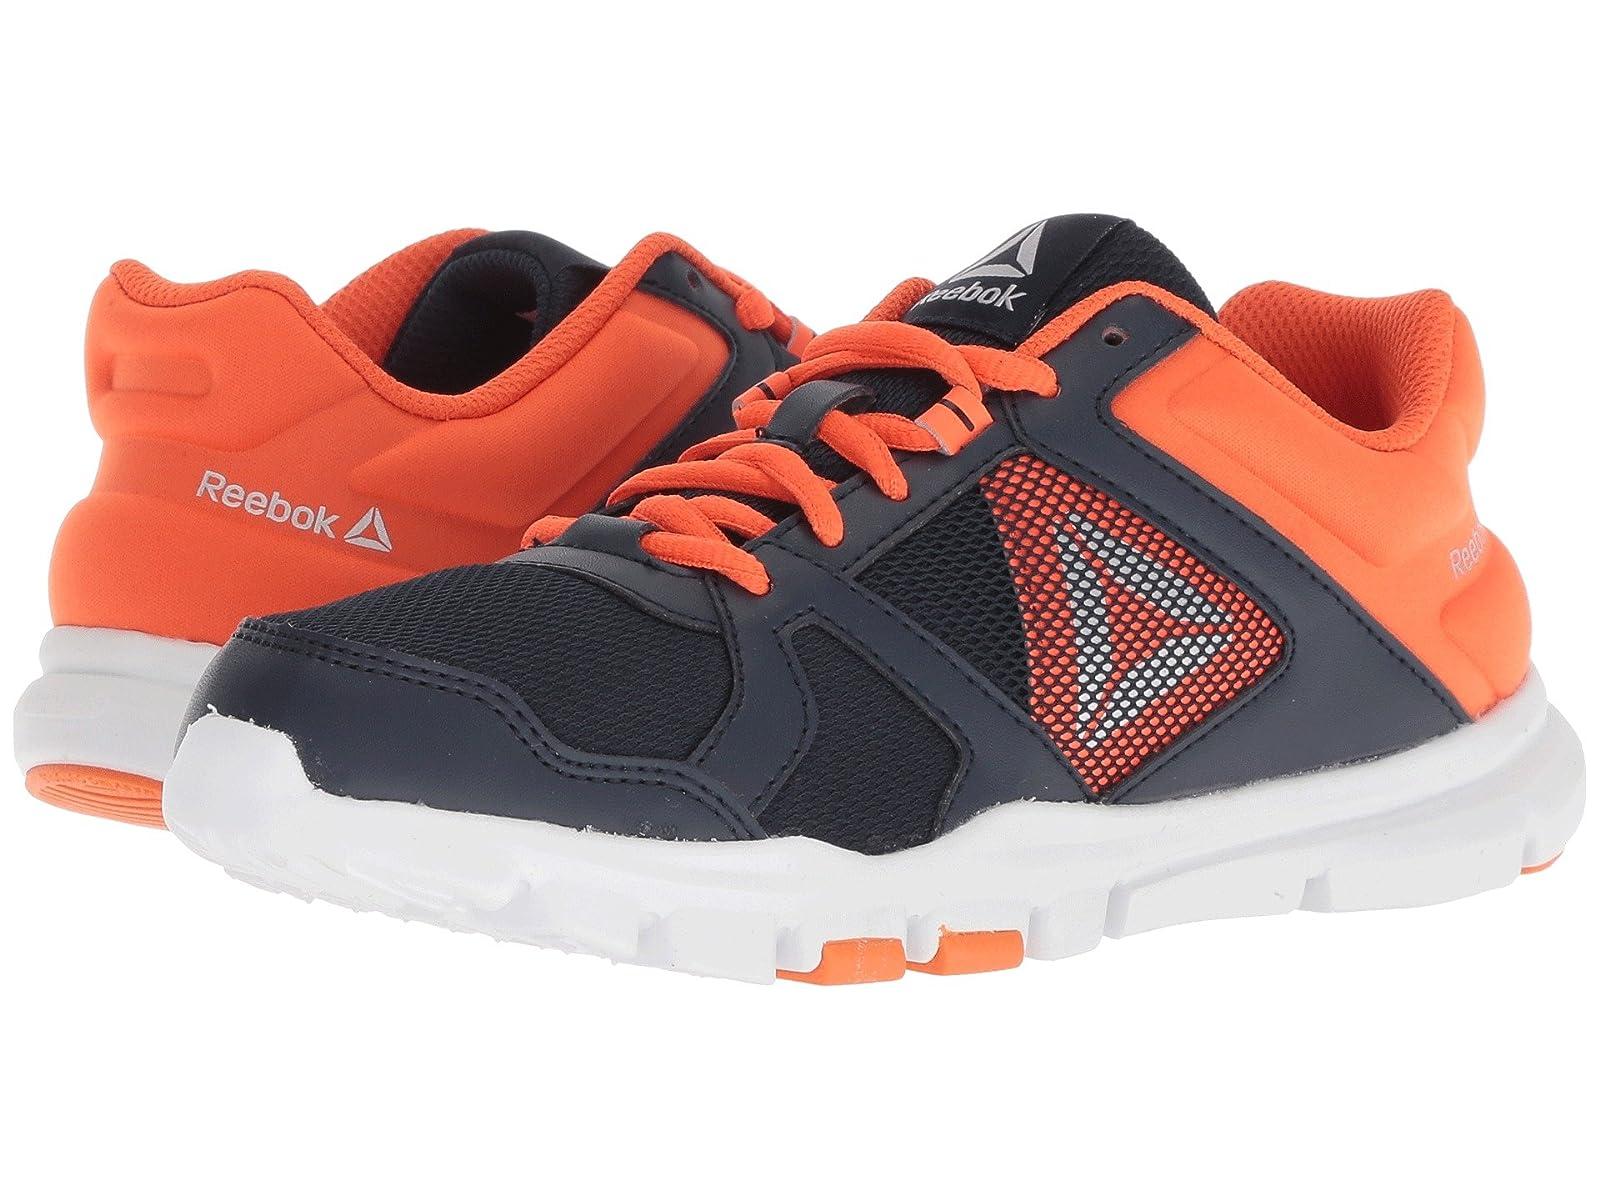 Reebok Kids Yourflex Train 10 (Little Kid/Big Kid)Atmospheric grades have affordable shoes